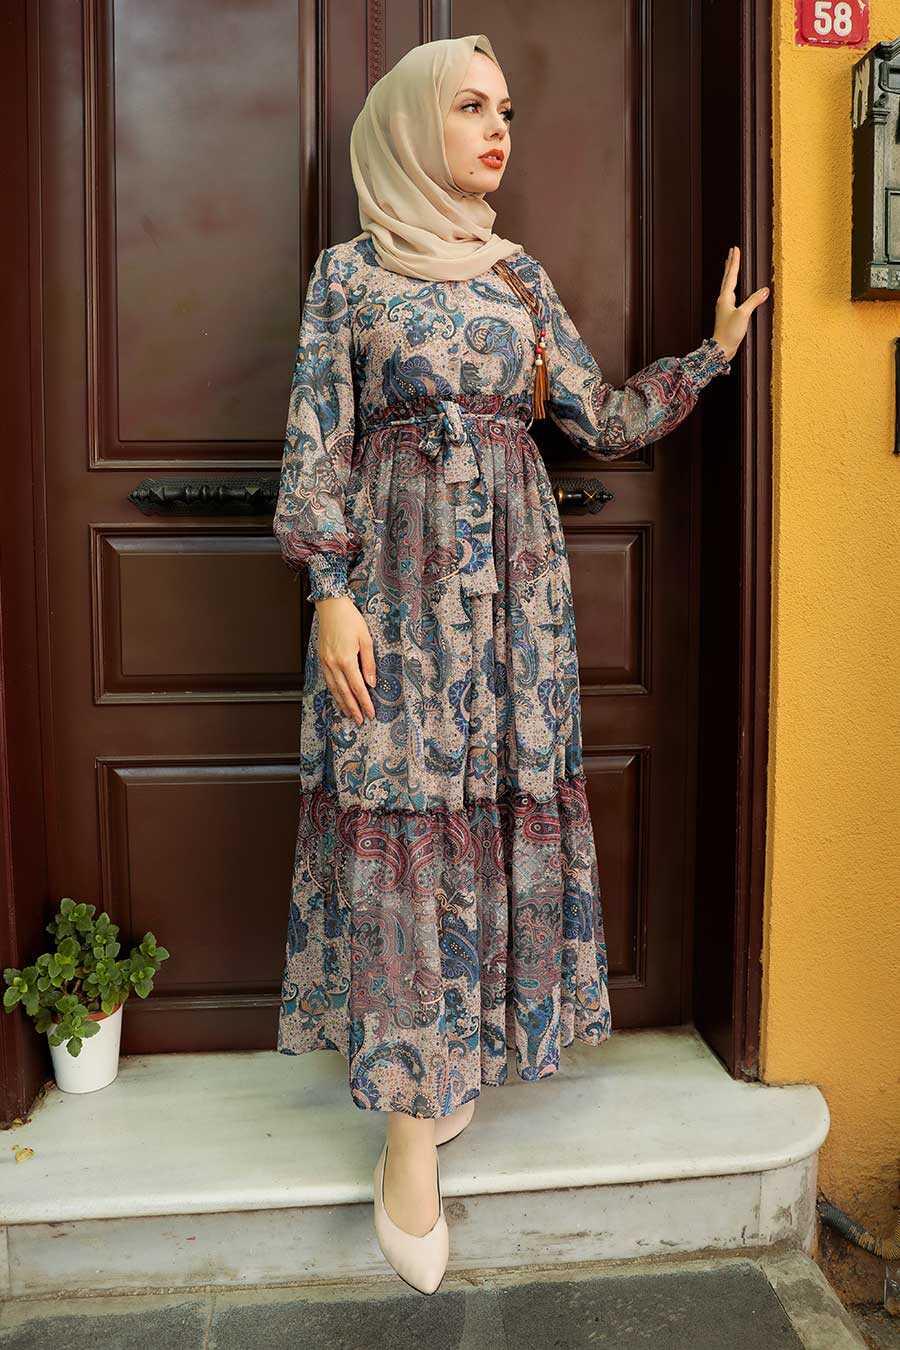 İndigo Blue Hijab Dress 76440IM